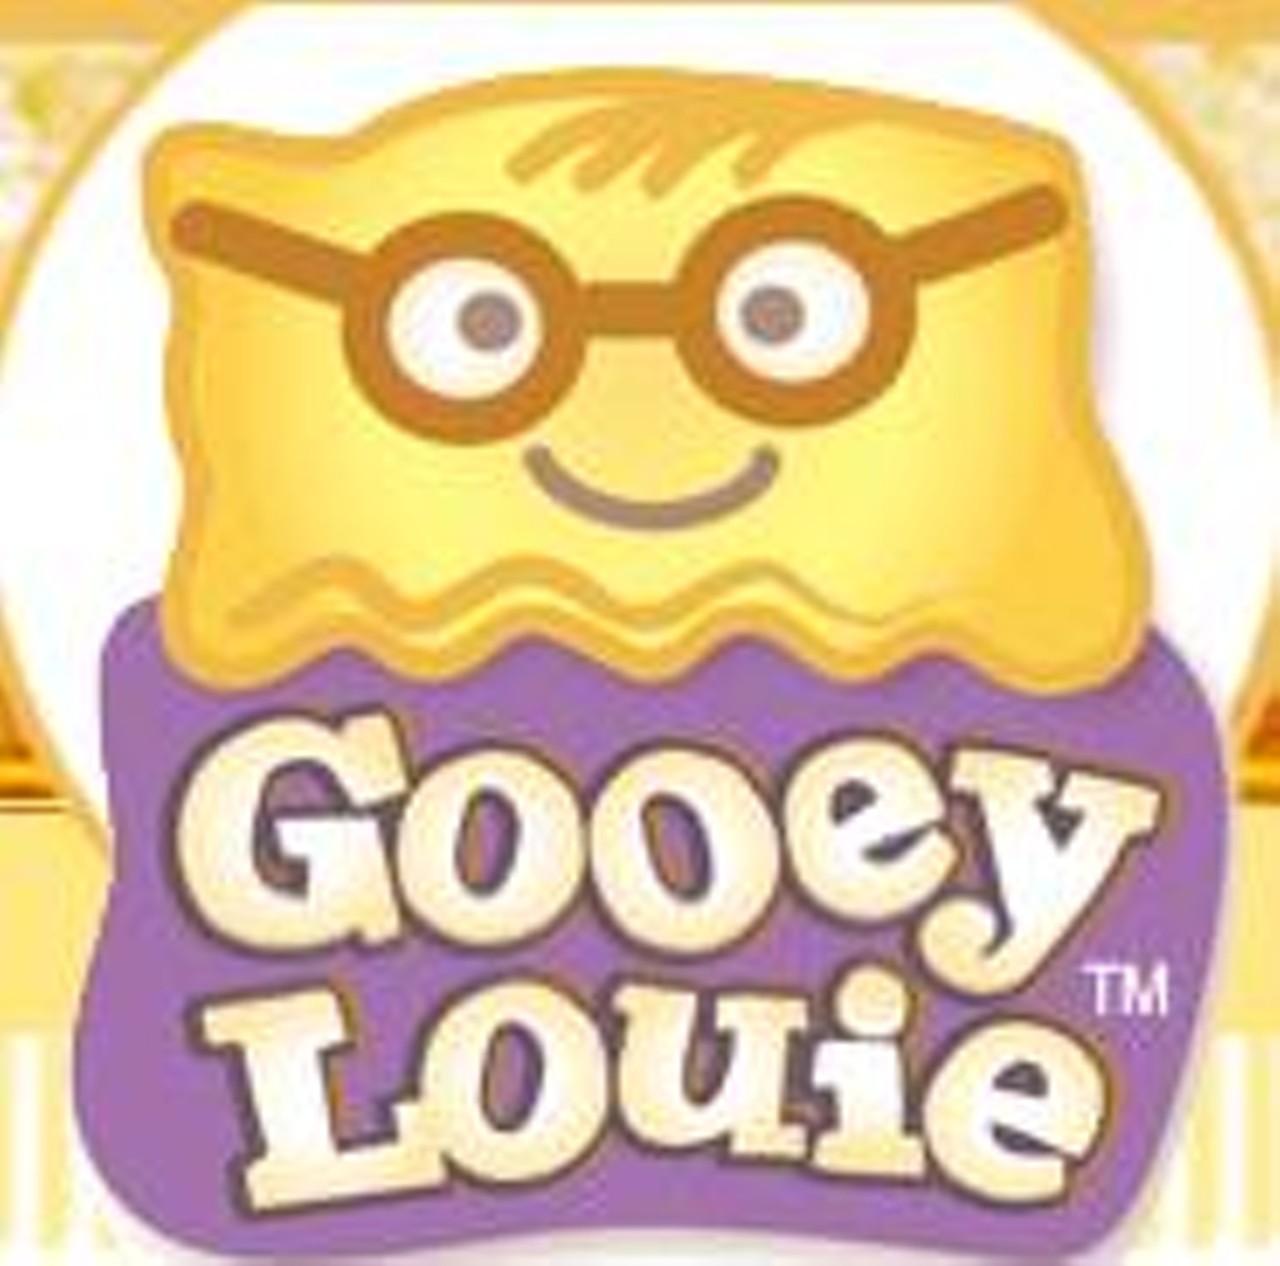 Butter Cake Gooey Louie